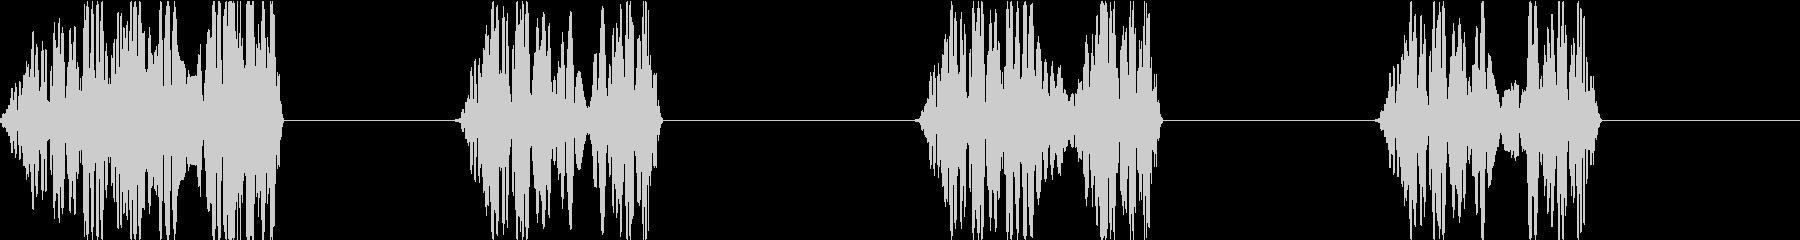 DJプレイ スクラッチ・ノイズ 259の未再生の波形